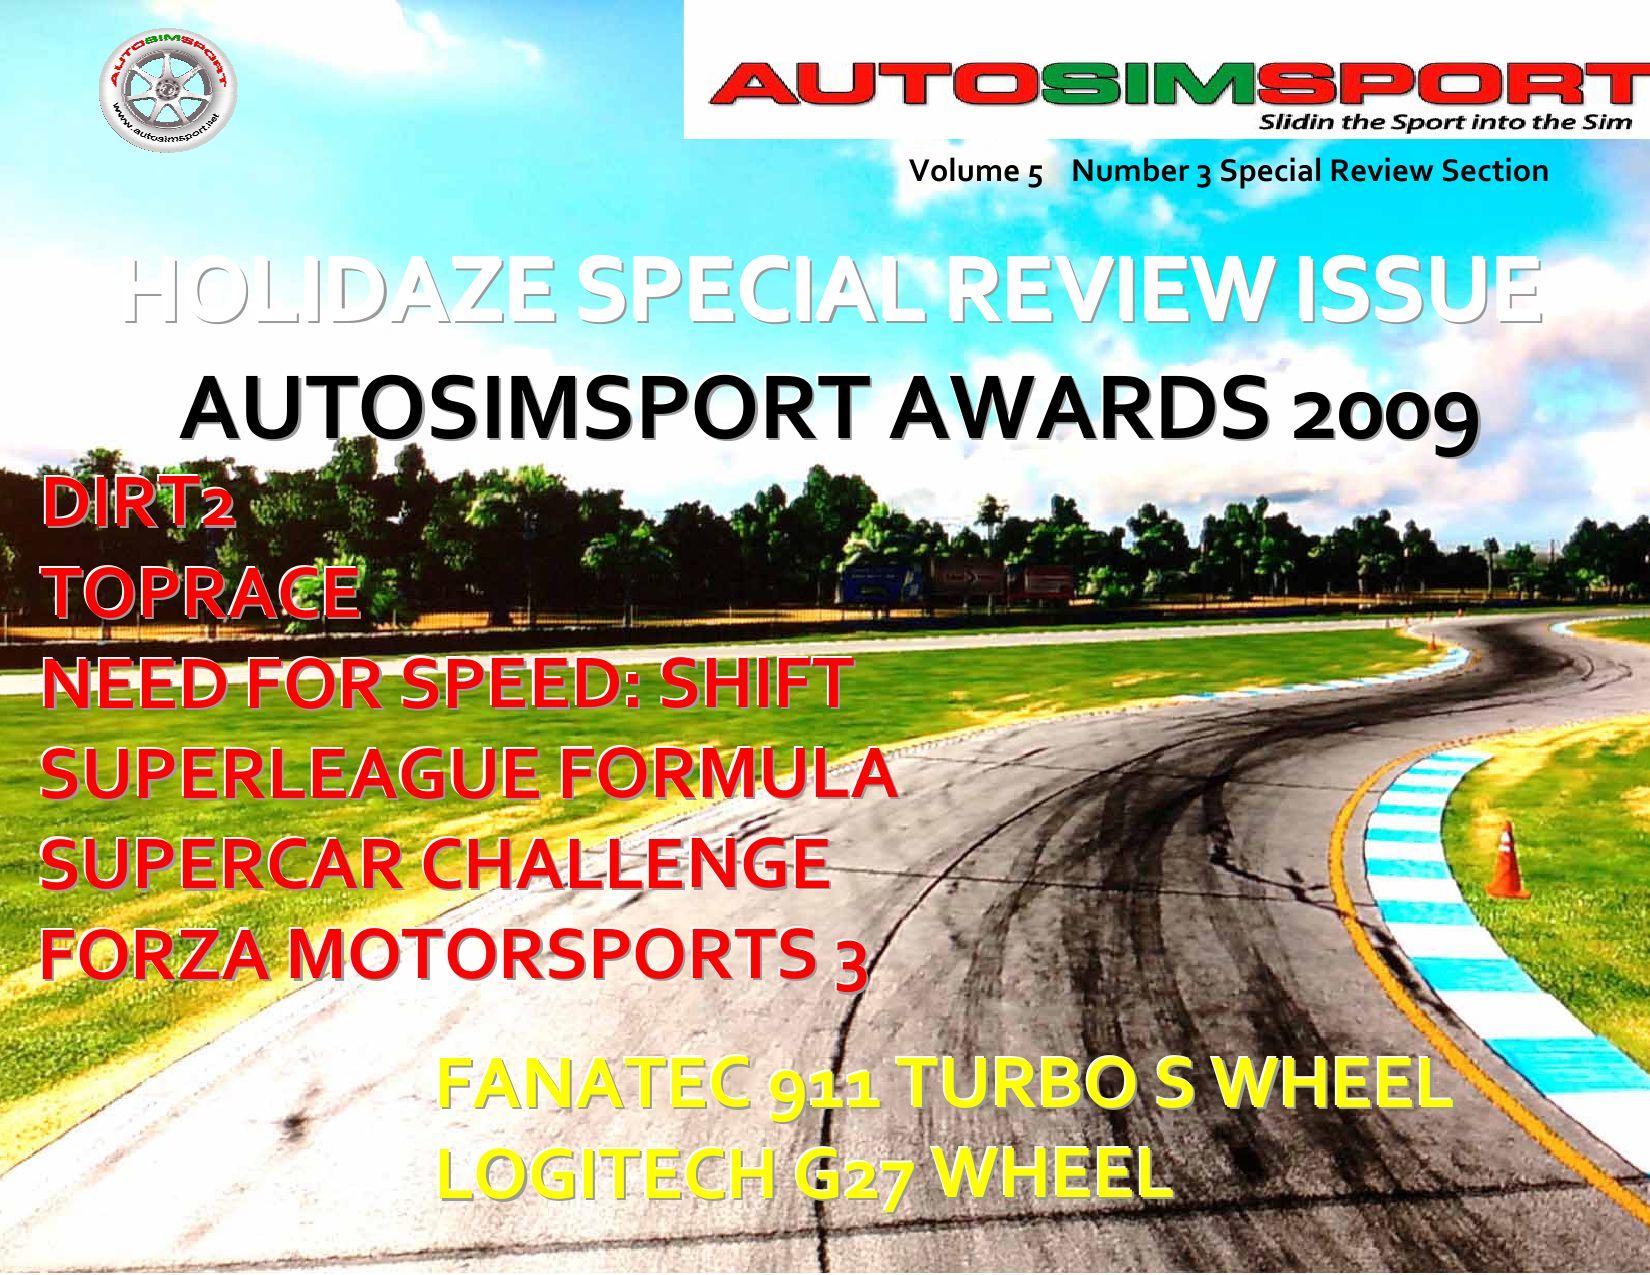 AutoSimSport Magazine, Volume 5, Issue 3, Special Review